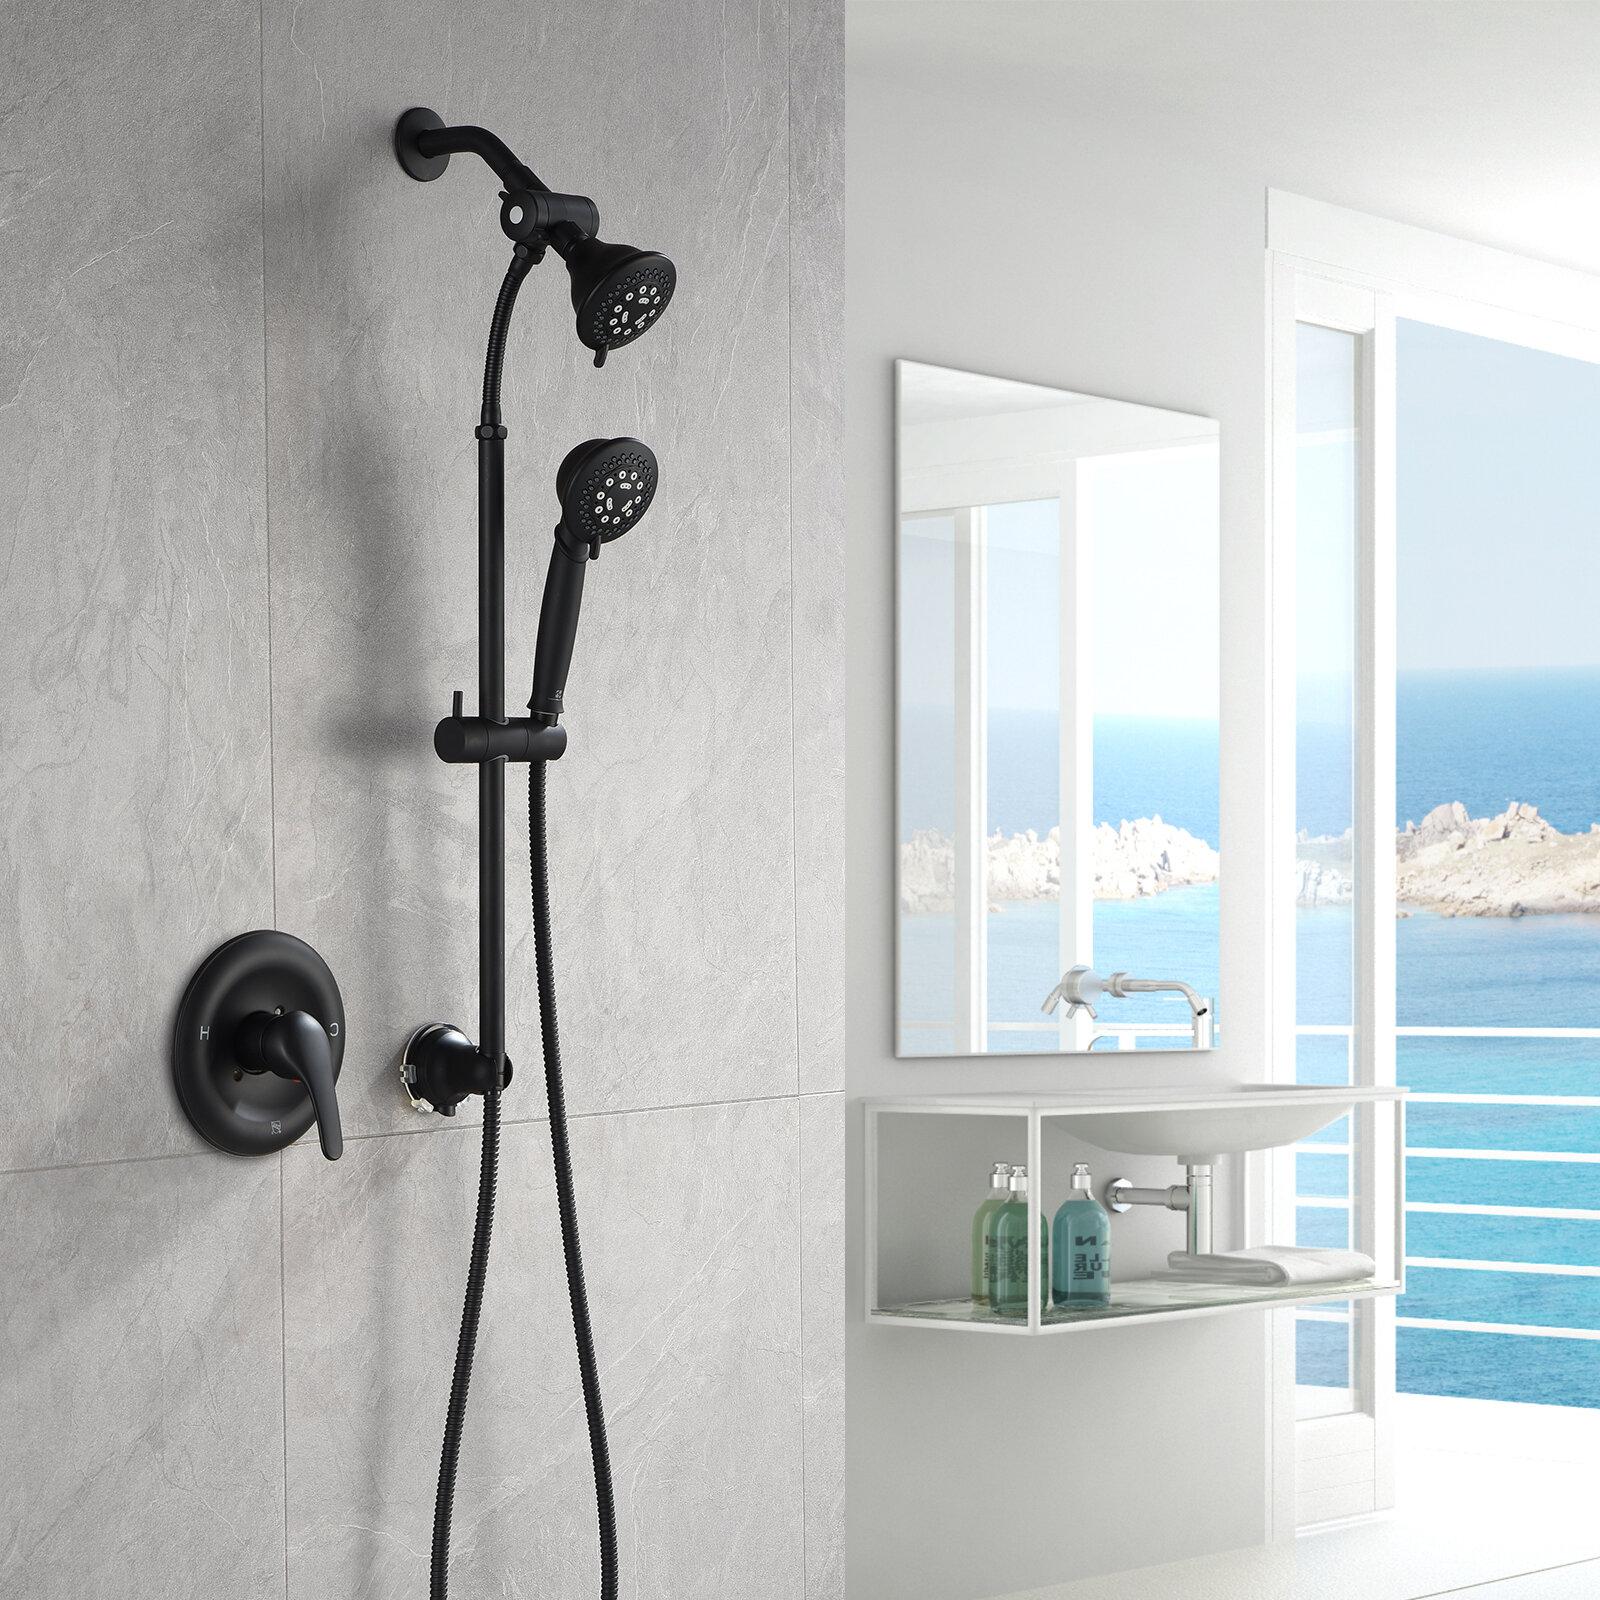 Mounted Self-adhesive Drill-free Shower Seat Showerhead Rack Shower Head Holder